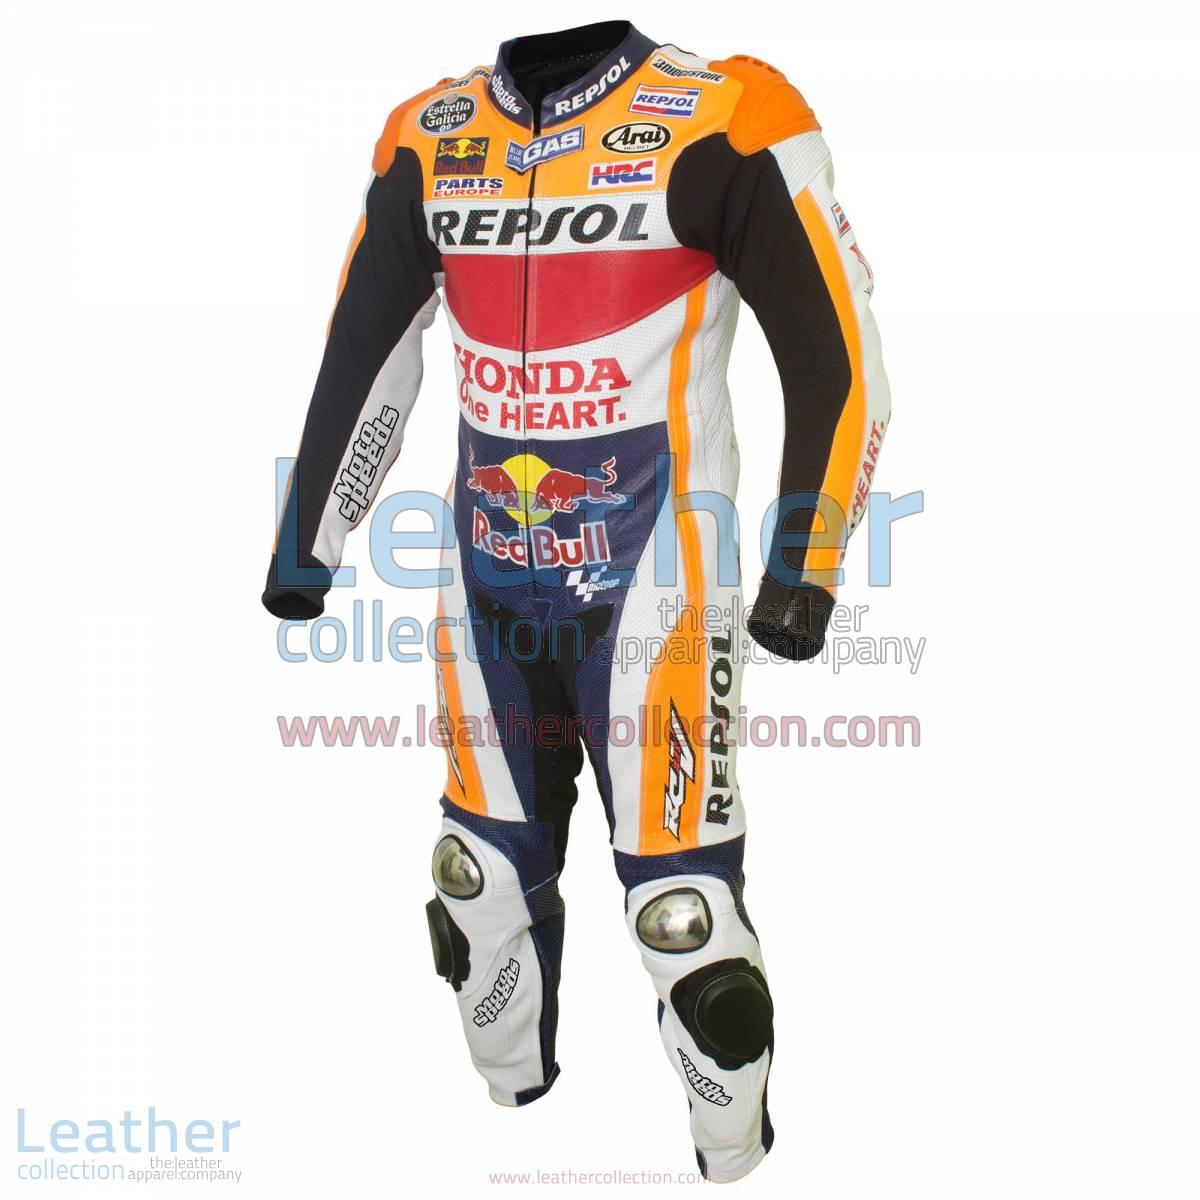 Dani Pedrosa Honda Repsol MotoGP 2015 Leathers | Dani Pedrosa leathers